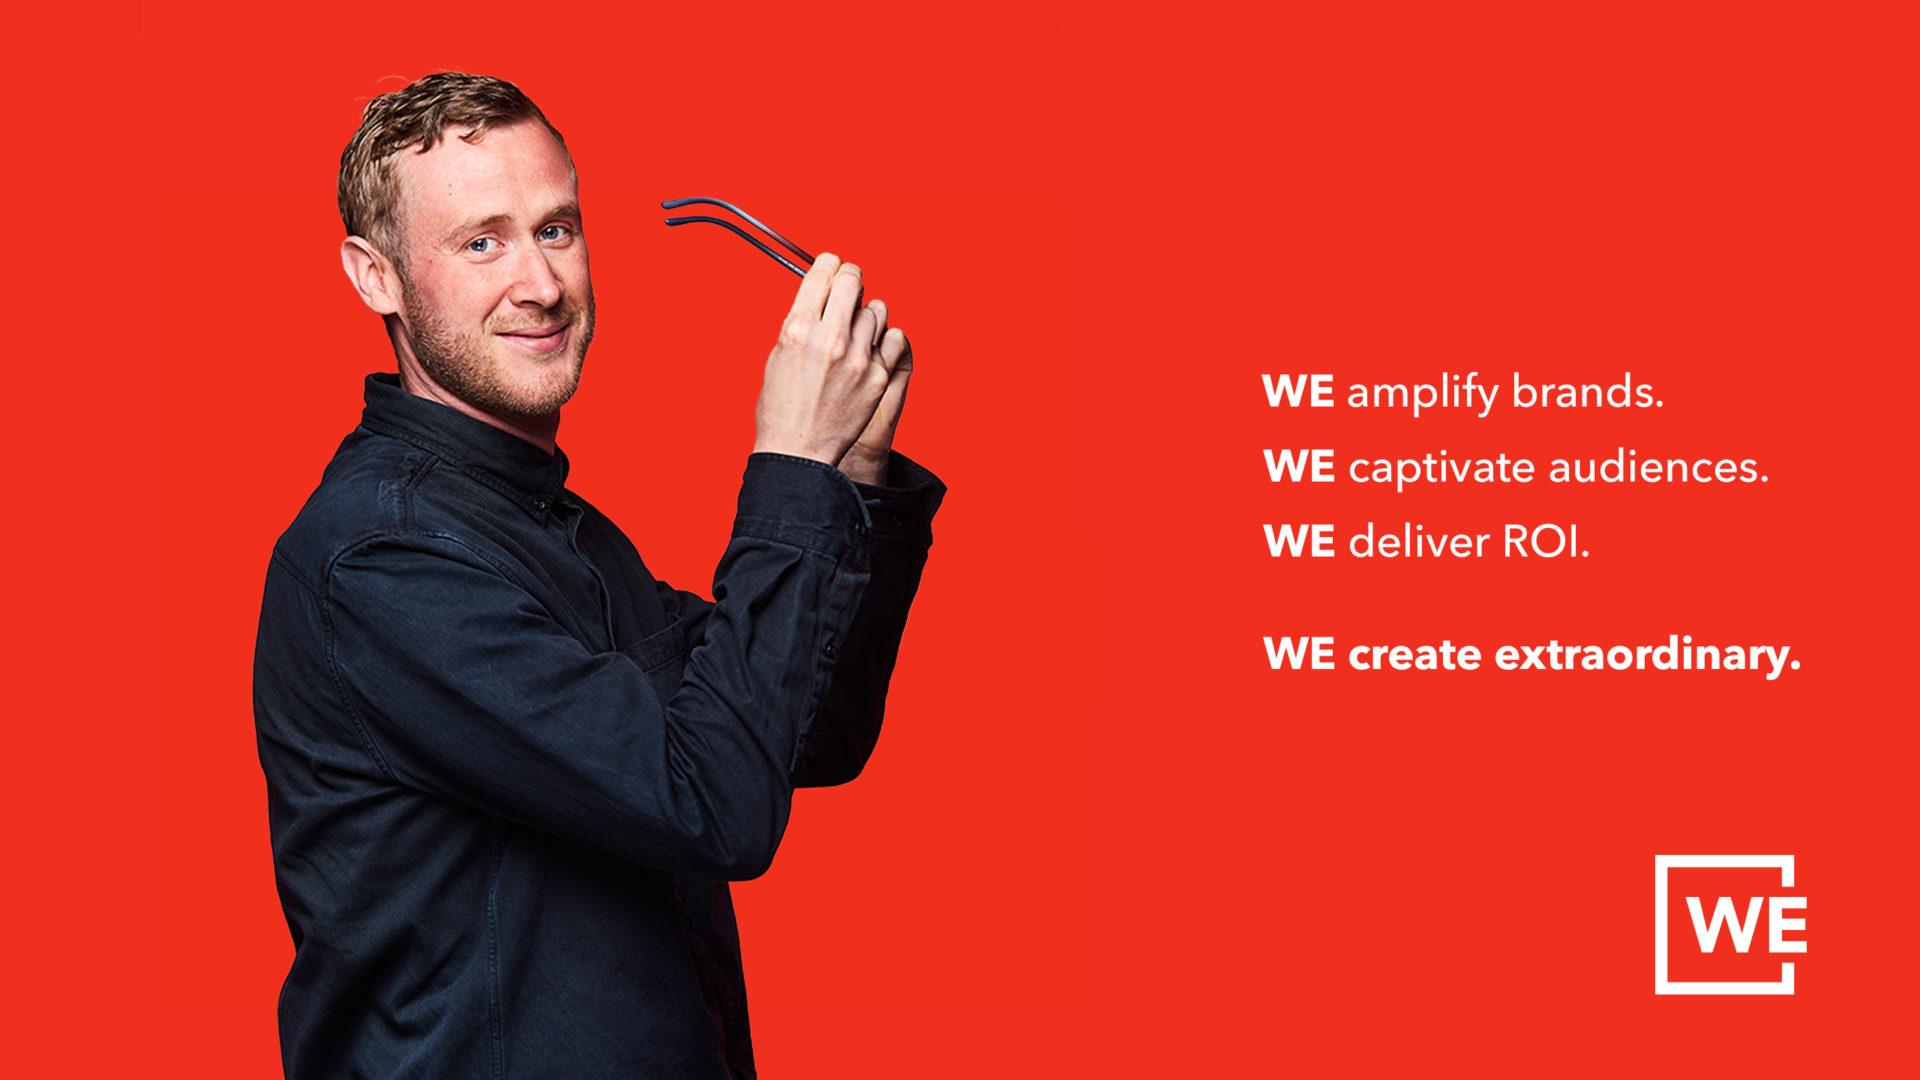 WE amplify brands